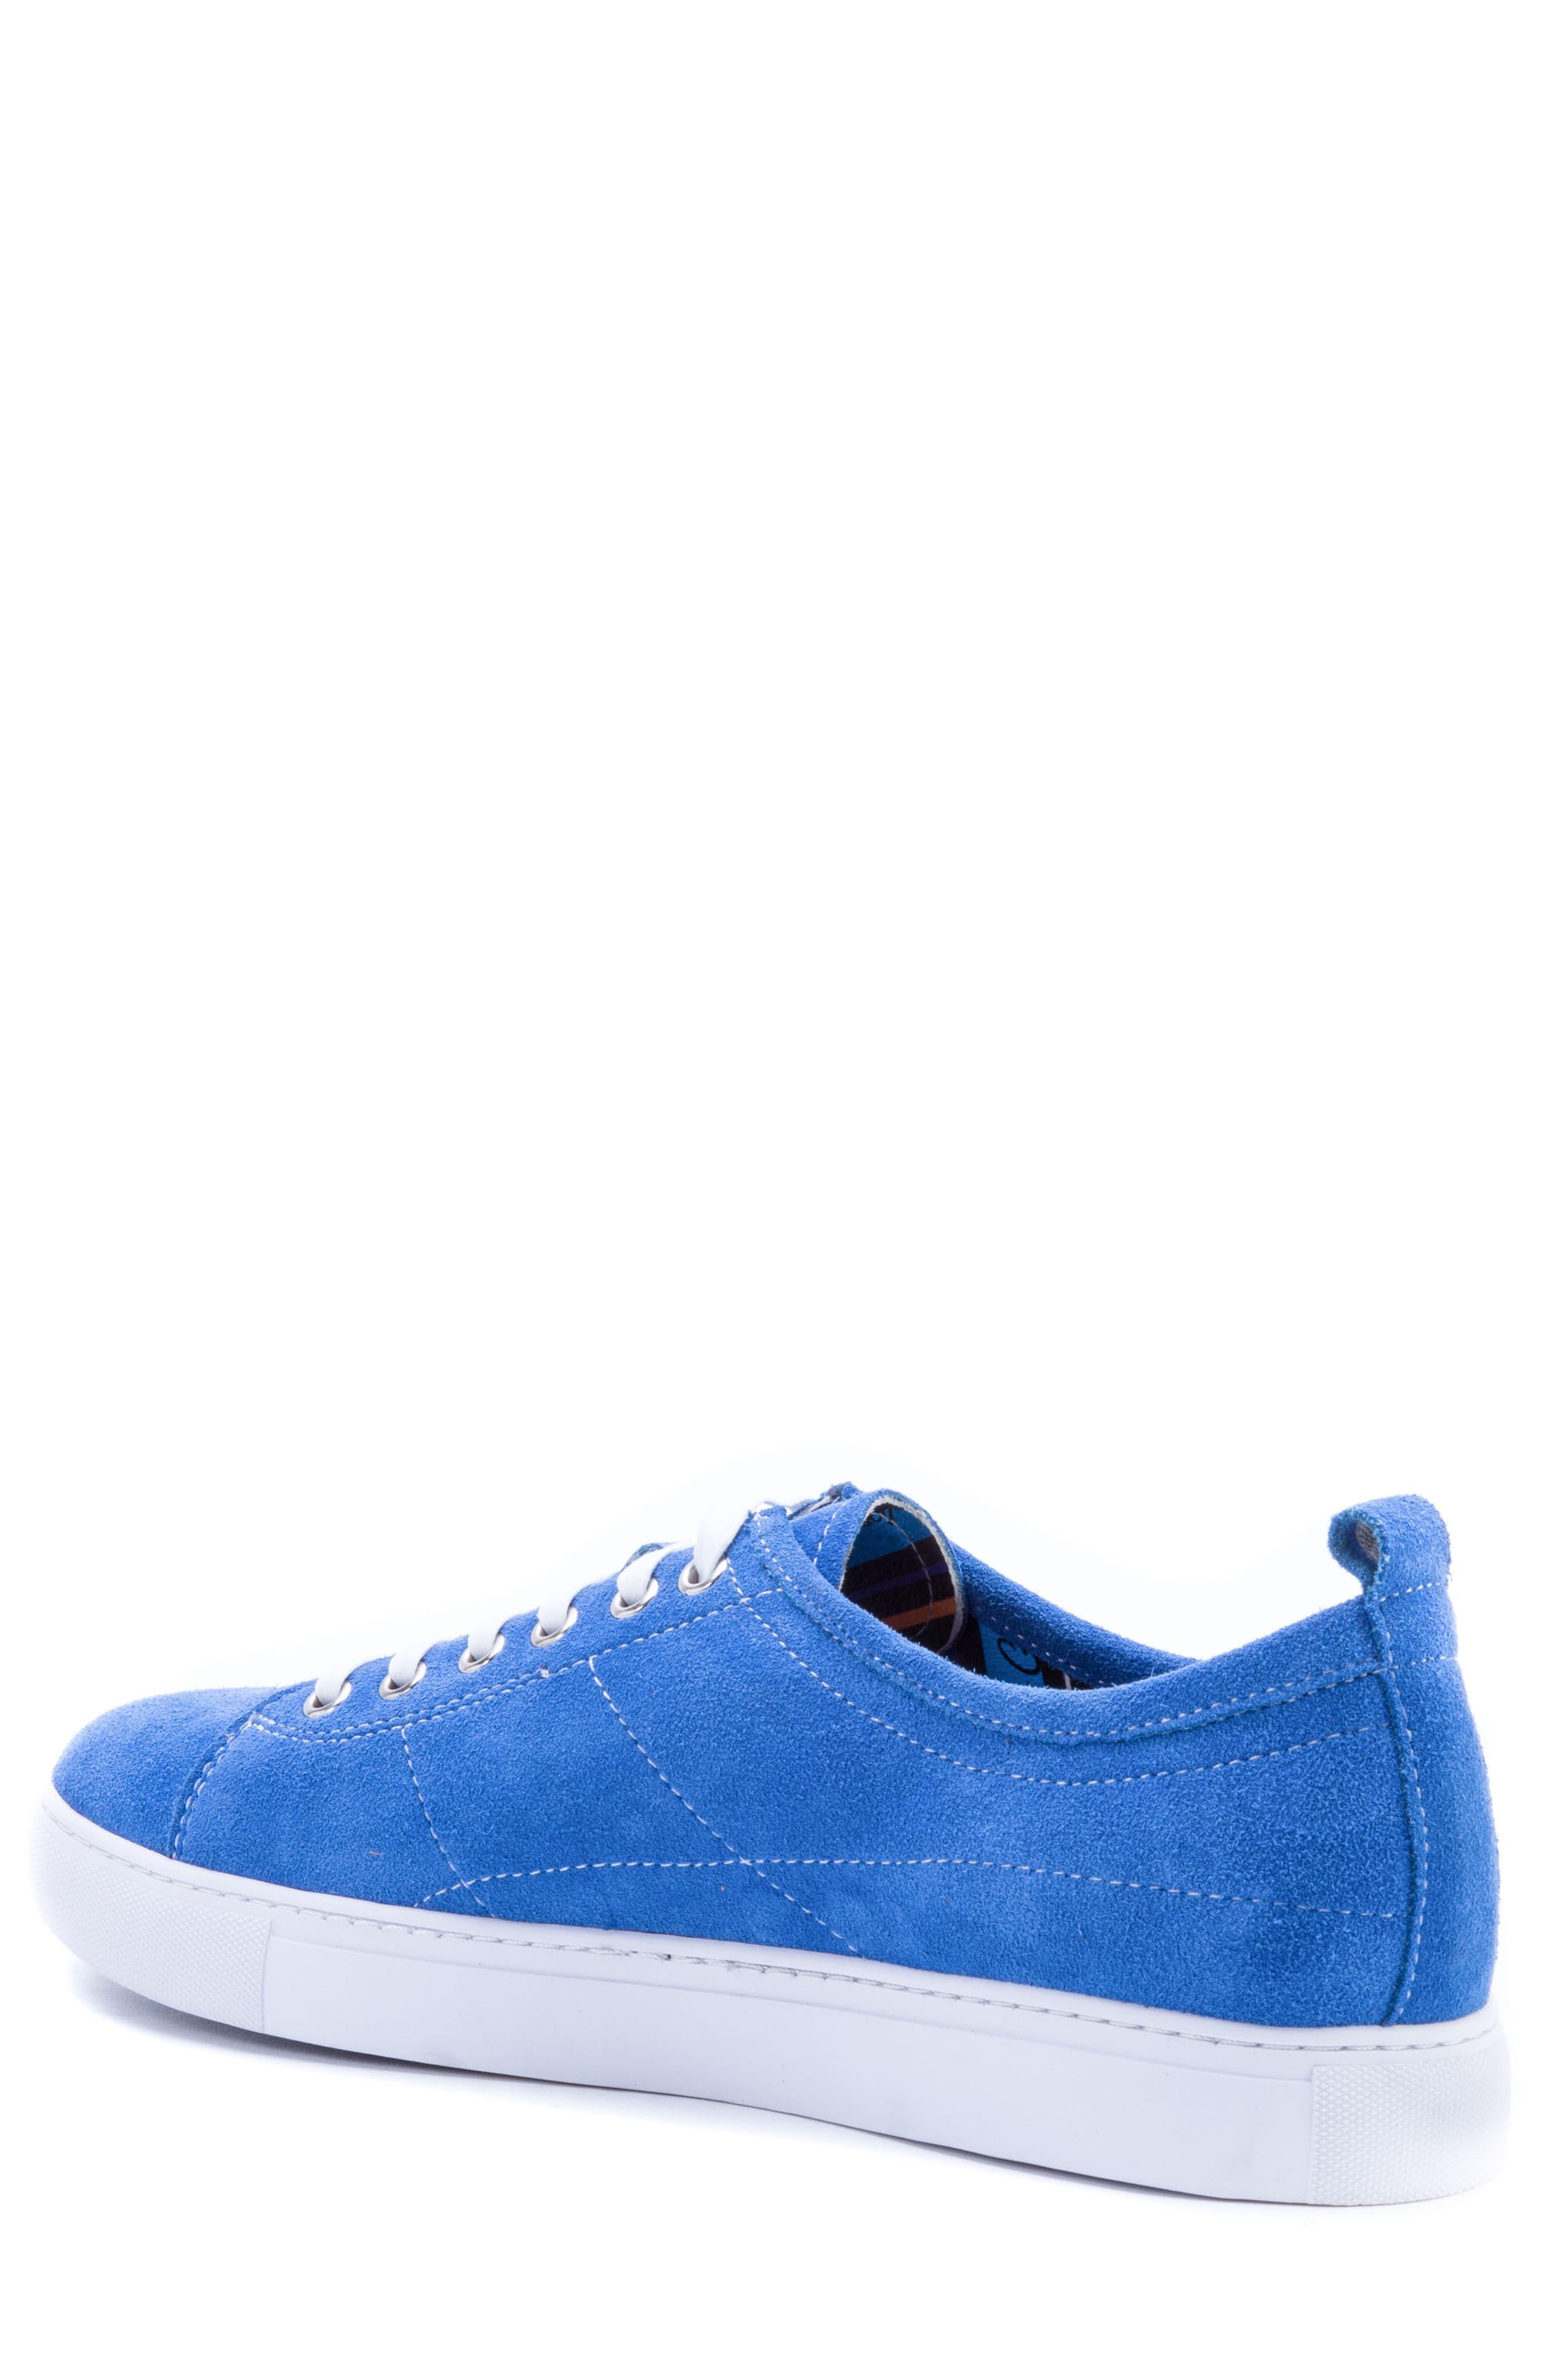 Ernesto Low Top Sneaker,                             Alternate thumbnail 2, color,                             ROYAL SUEDE